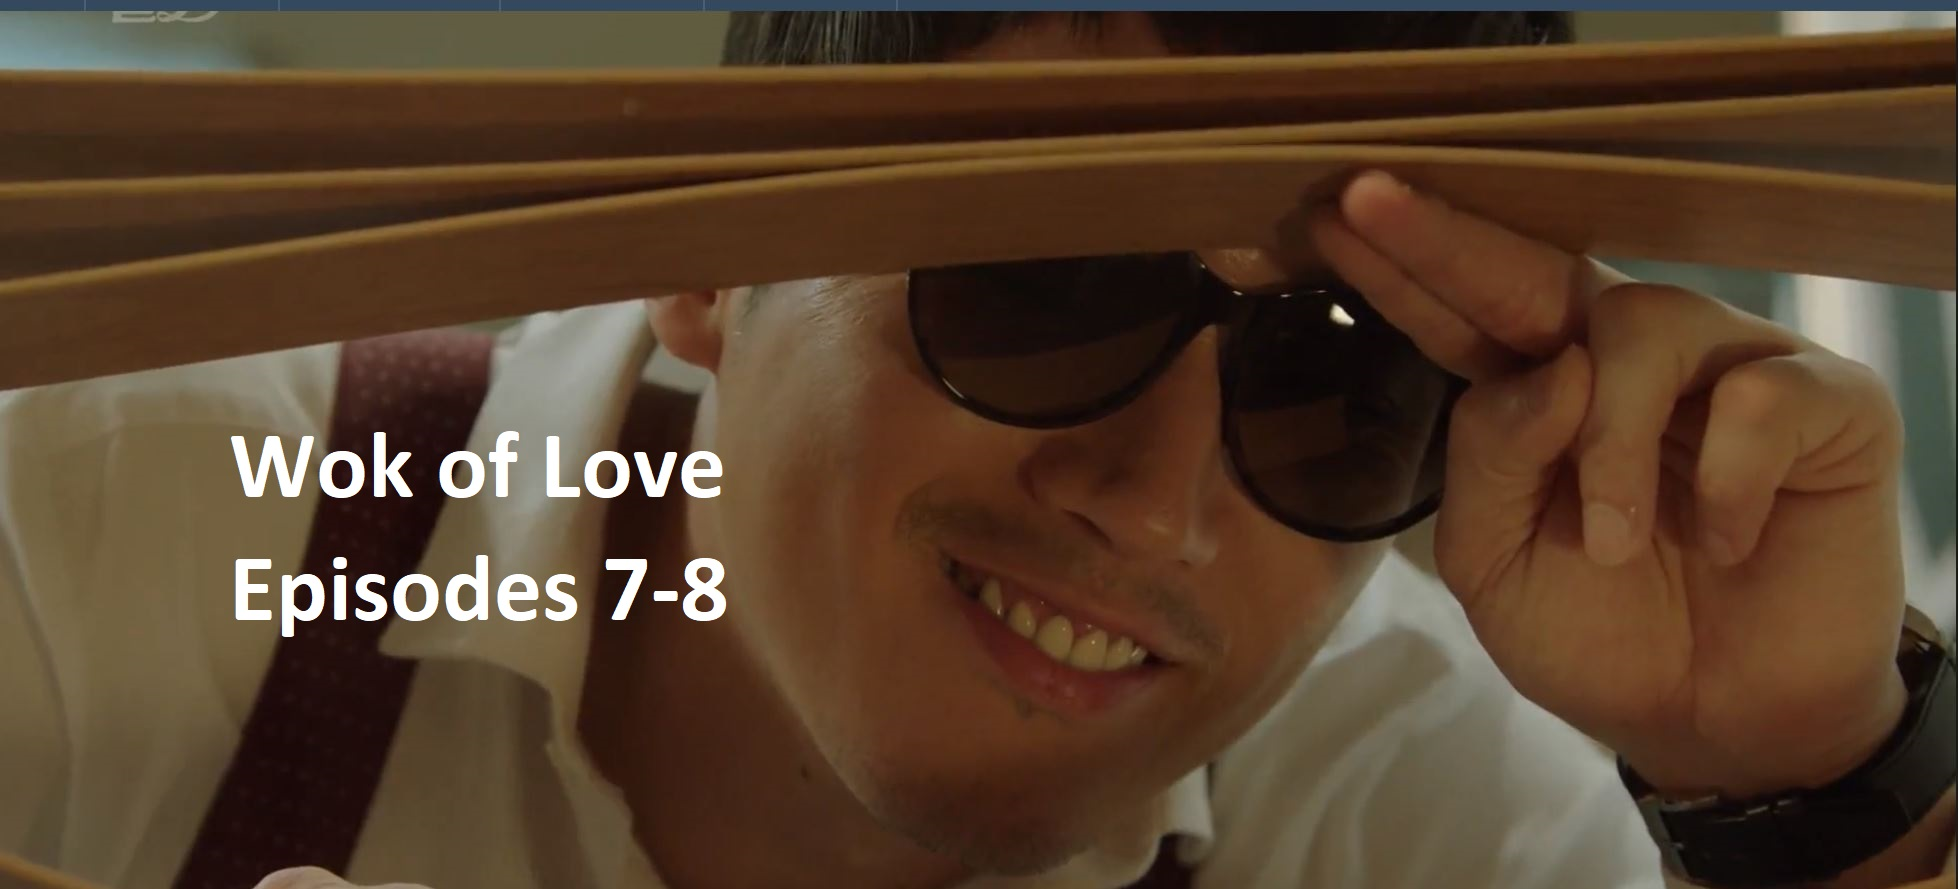 Wok of Love Episode 7-8 | amusings